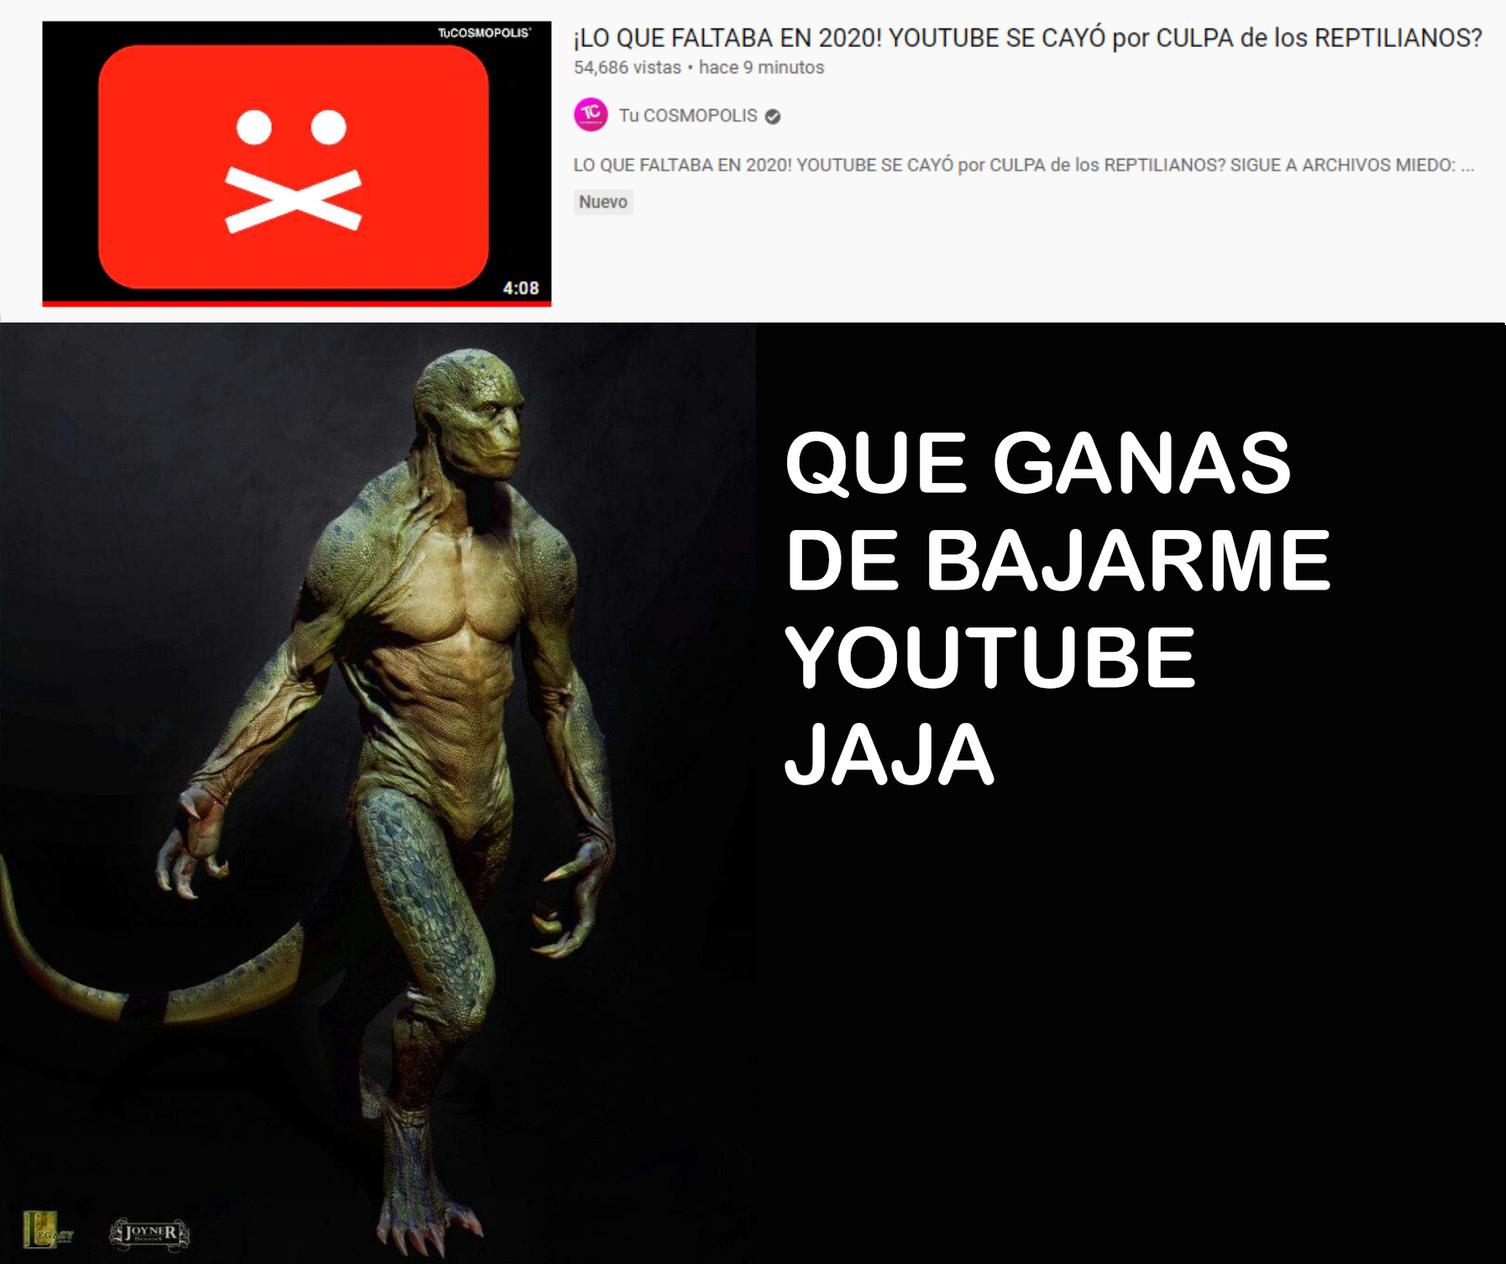 TU COSMOPOLIS TIENE DE LA BUENA HIERBITA - meme